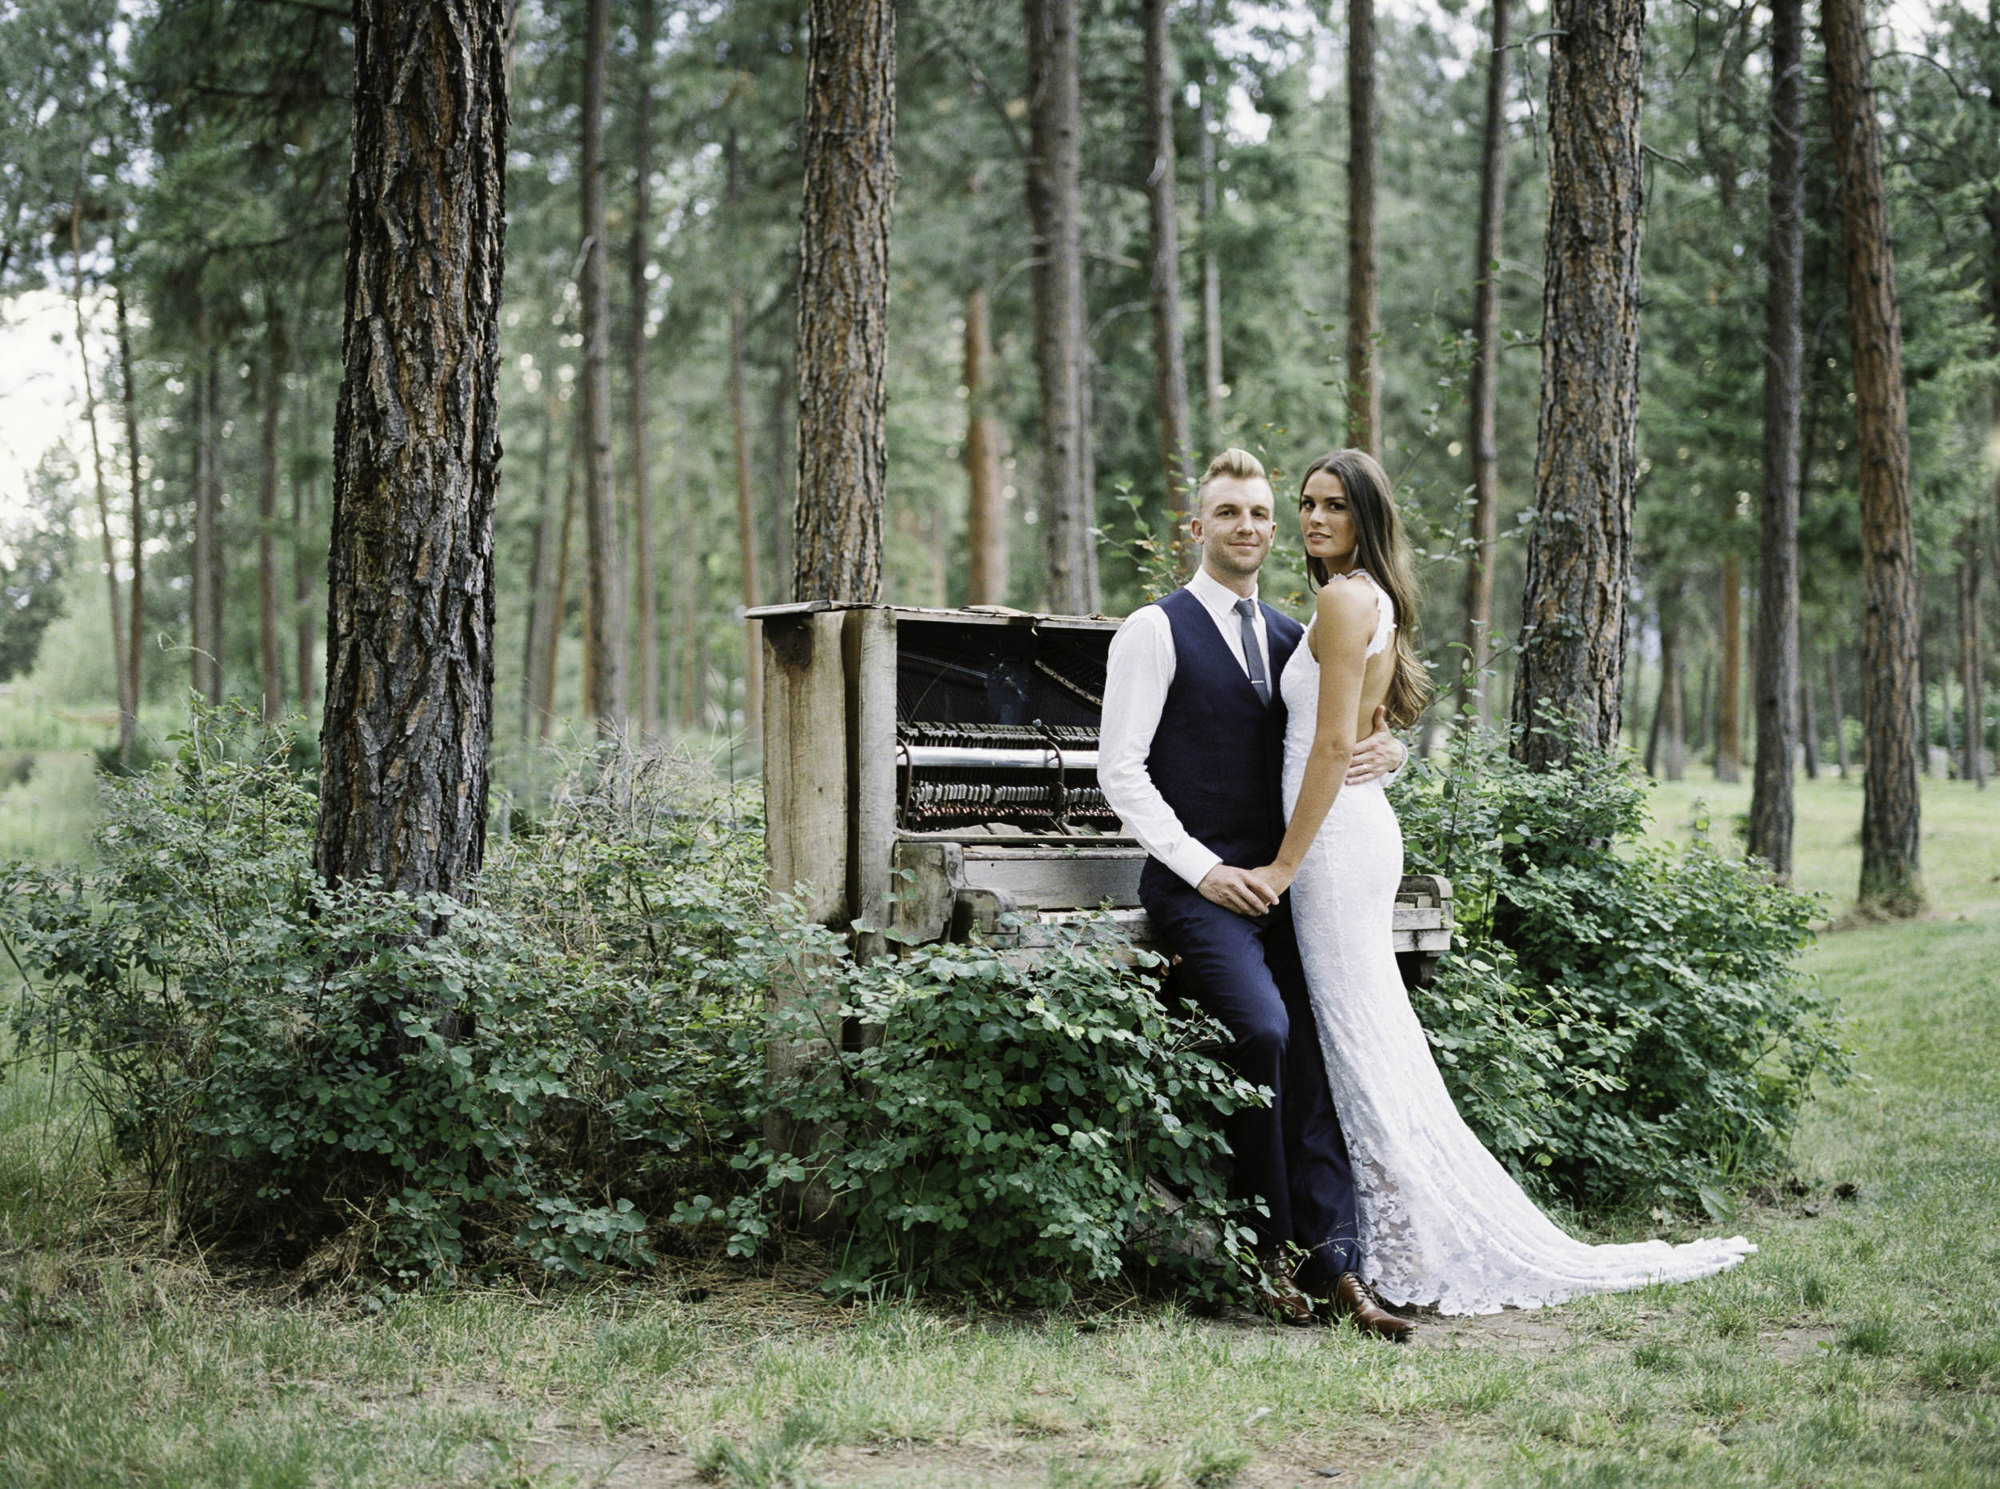 Kelowna-wedding-Bottega-old-piano.jpg